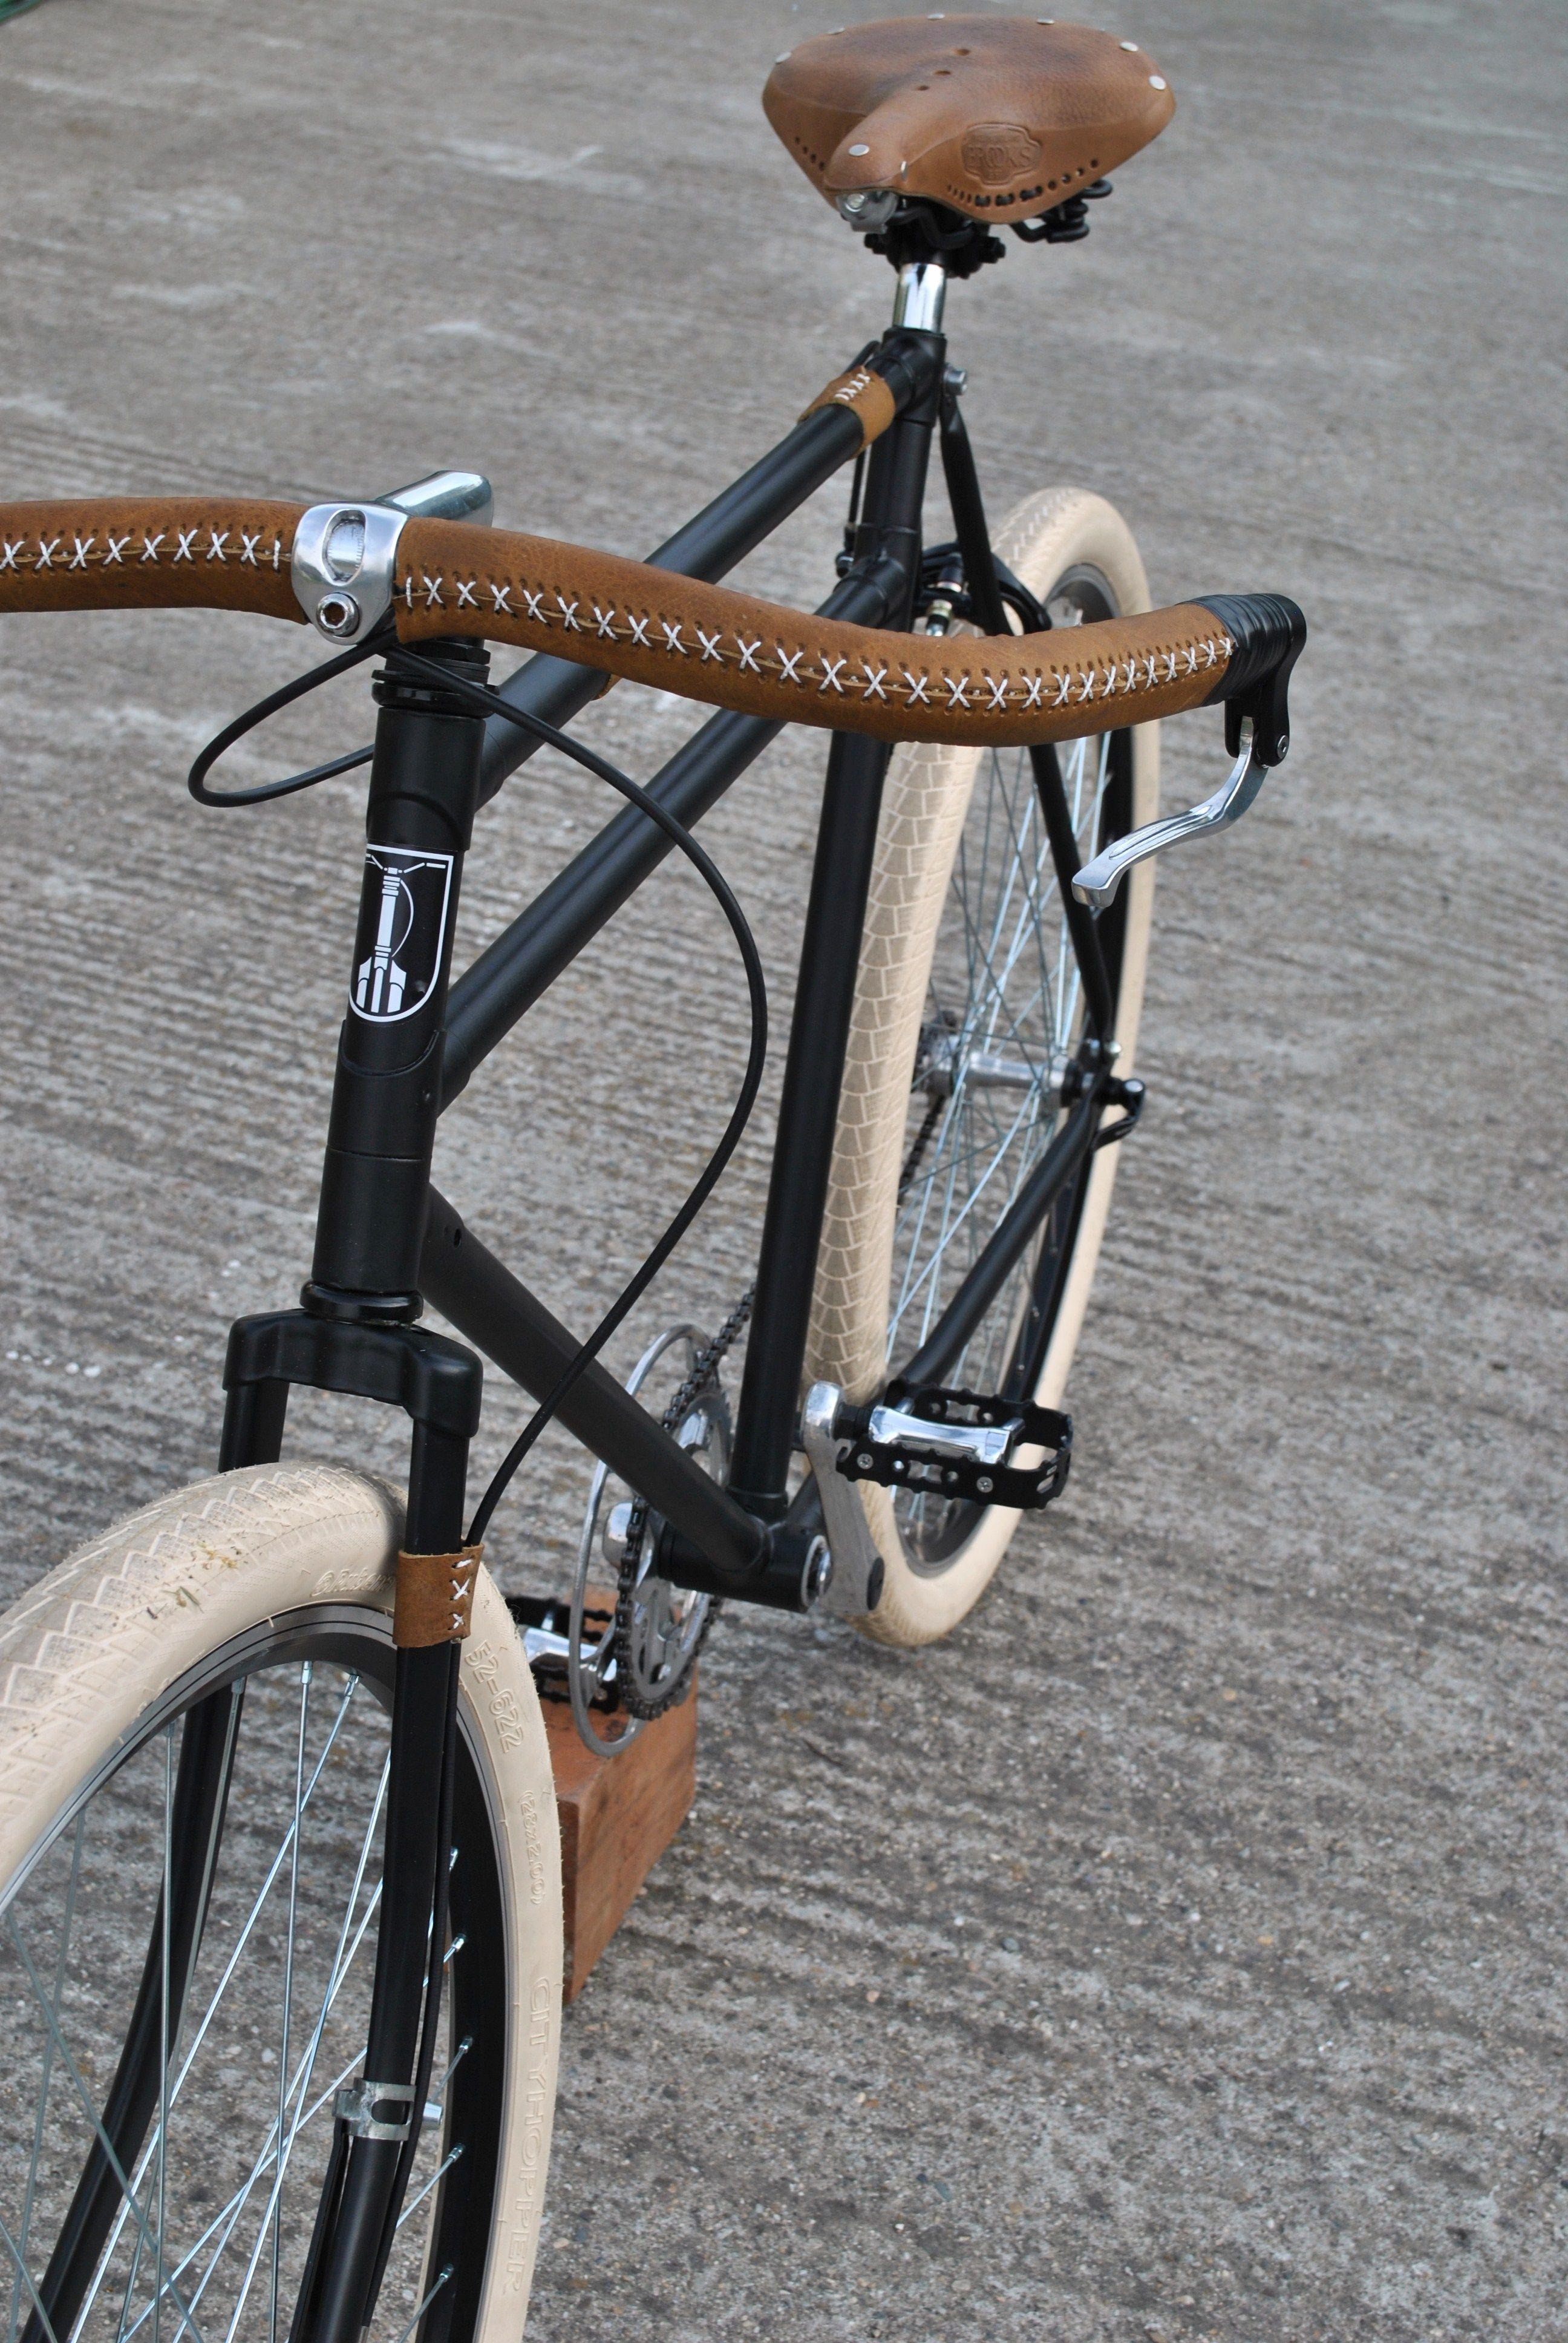 city bike leather details moto bikes retro fahrrad. Black Bedroom Furniture Sets. Home Design Ideas